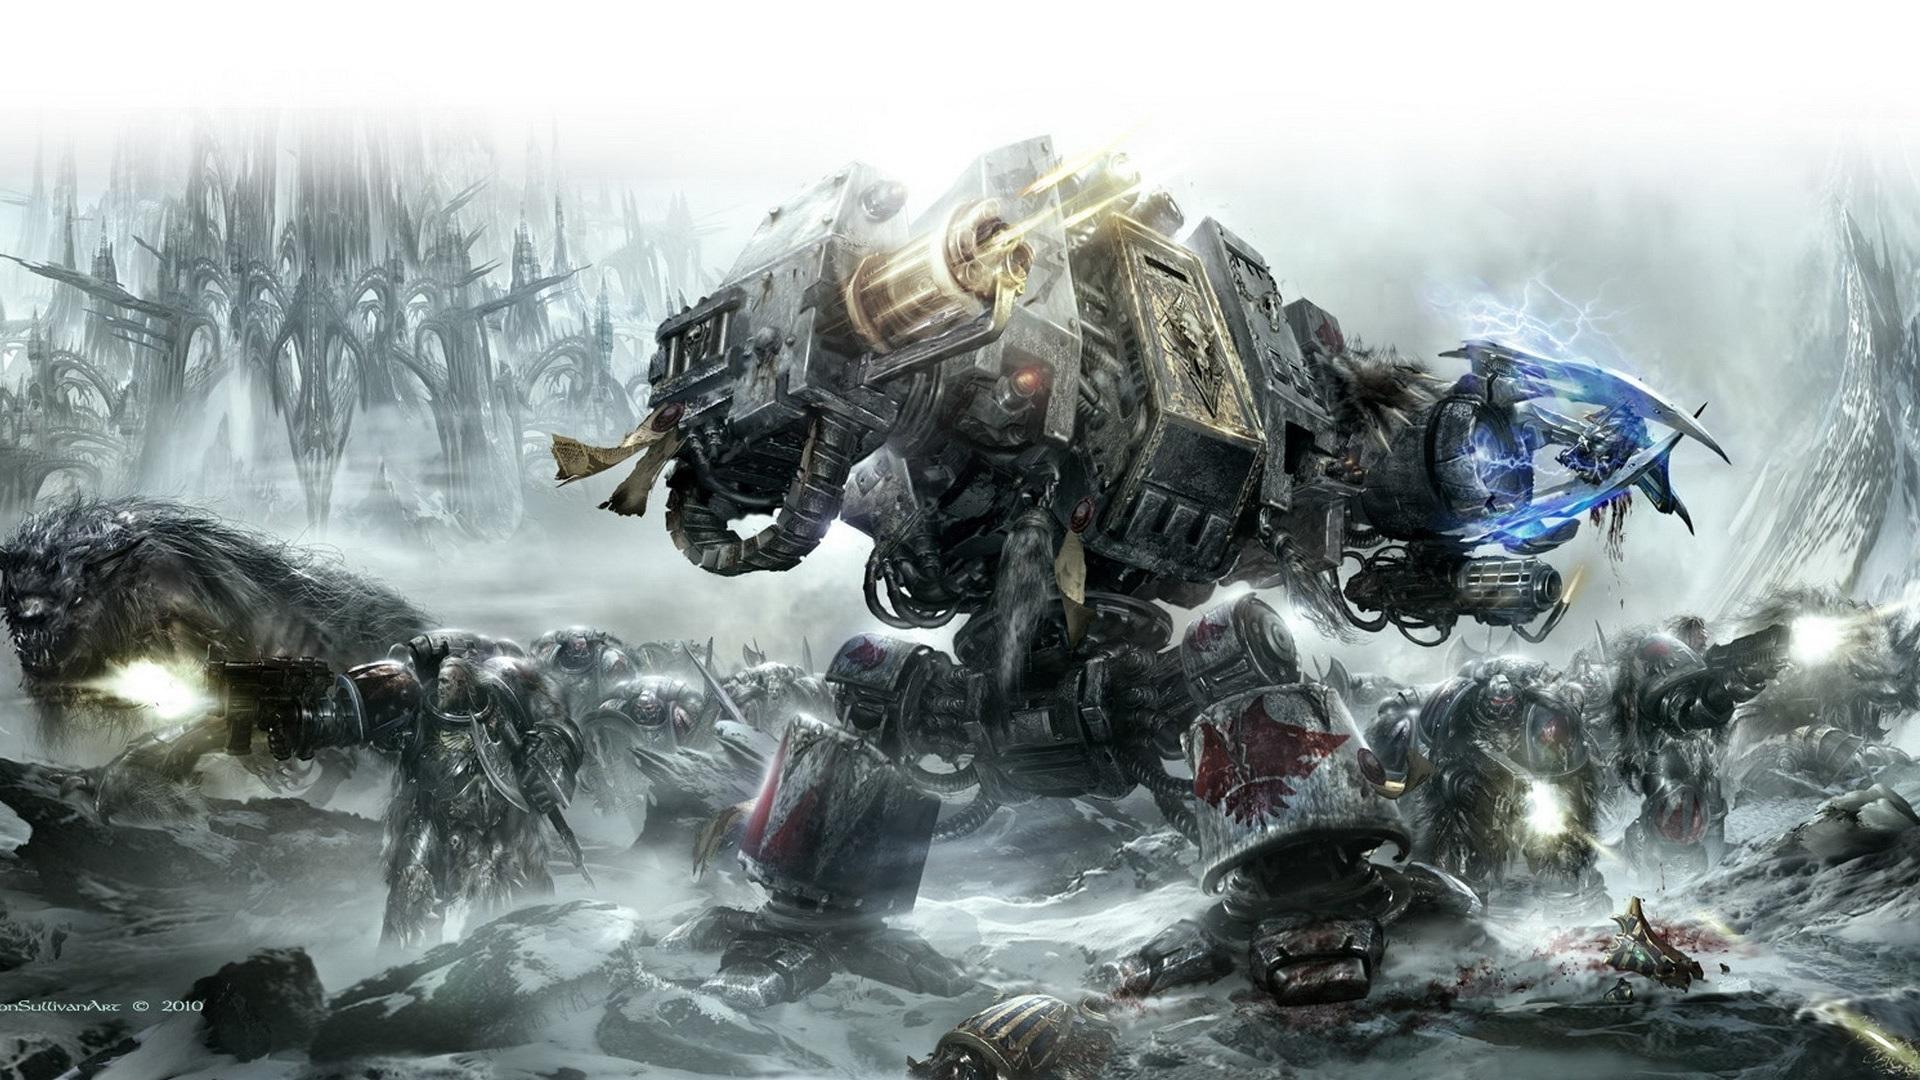 fonds d'écran warhammer 40000: space marine hd hd, image